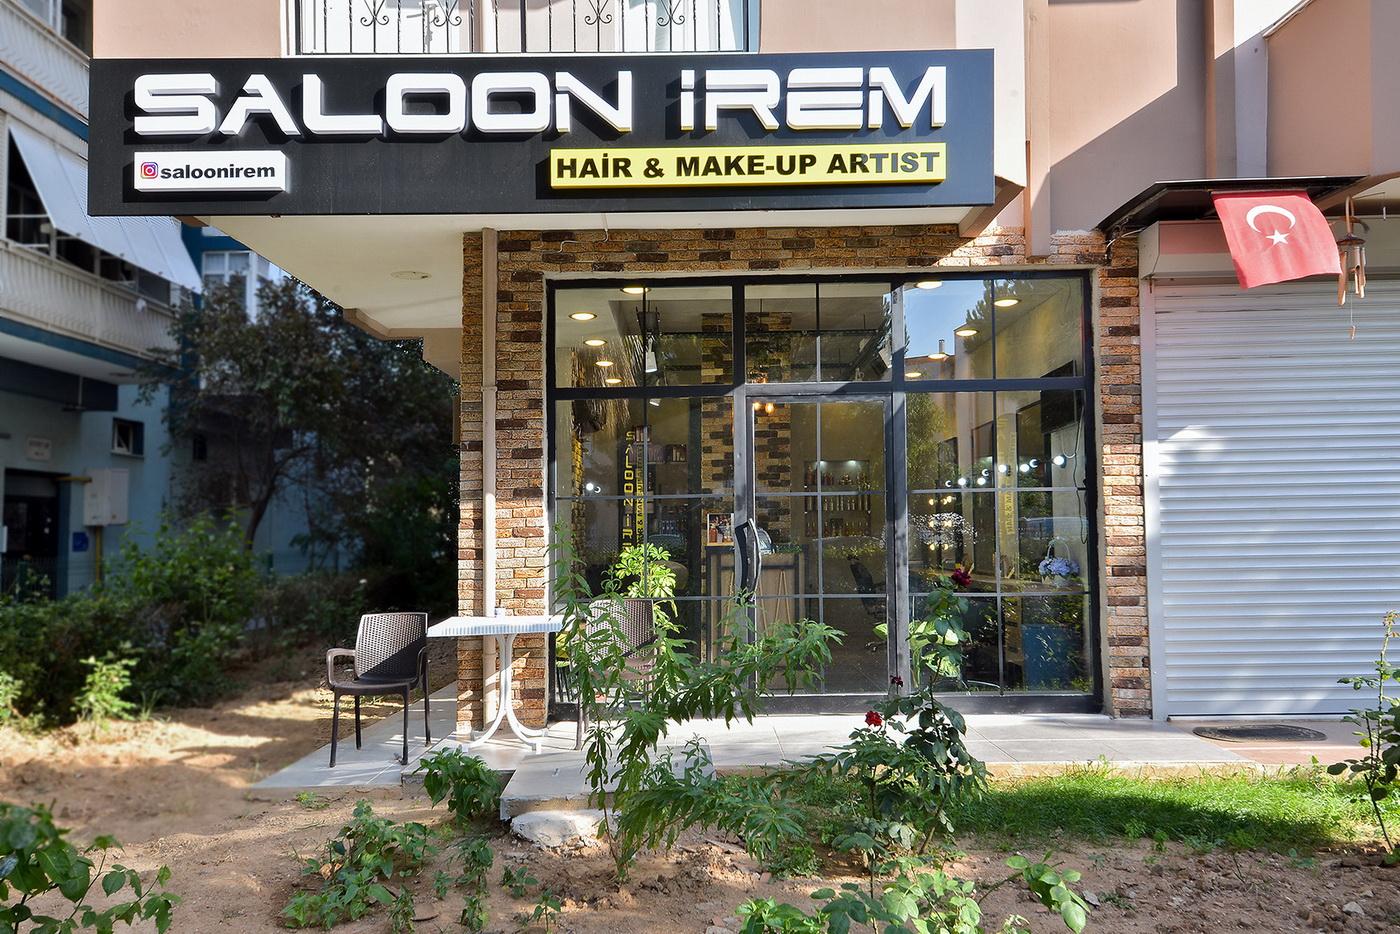 İzmir - Saloon Irem